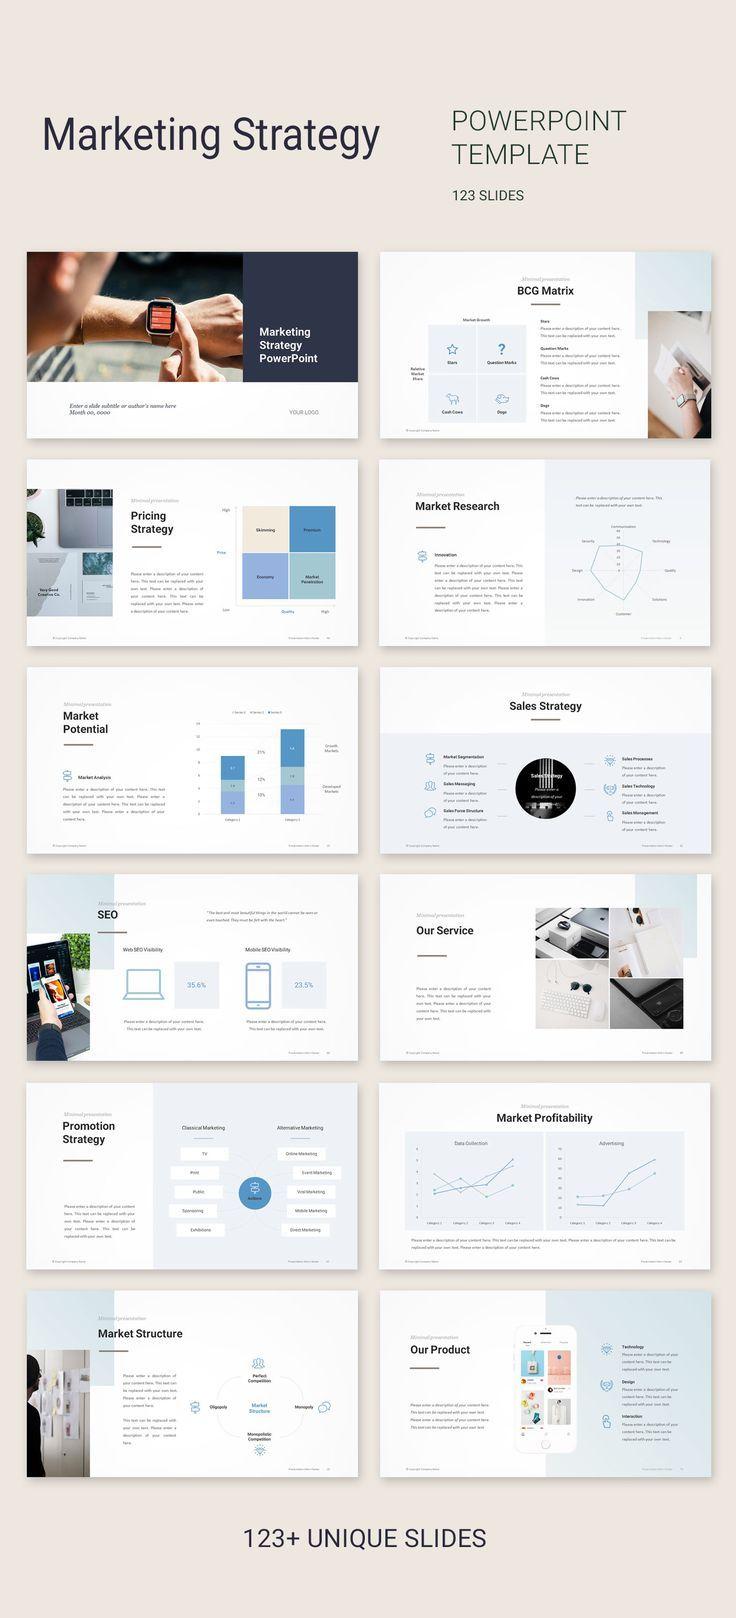 Marketing Plan Template Marketing Template Vorlage Fur Marketingplan Modele De Plan In 2020 Marketing Presentation Marketing Plan Template Digital Marketing Plan